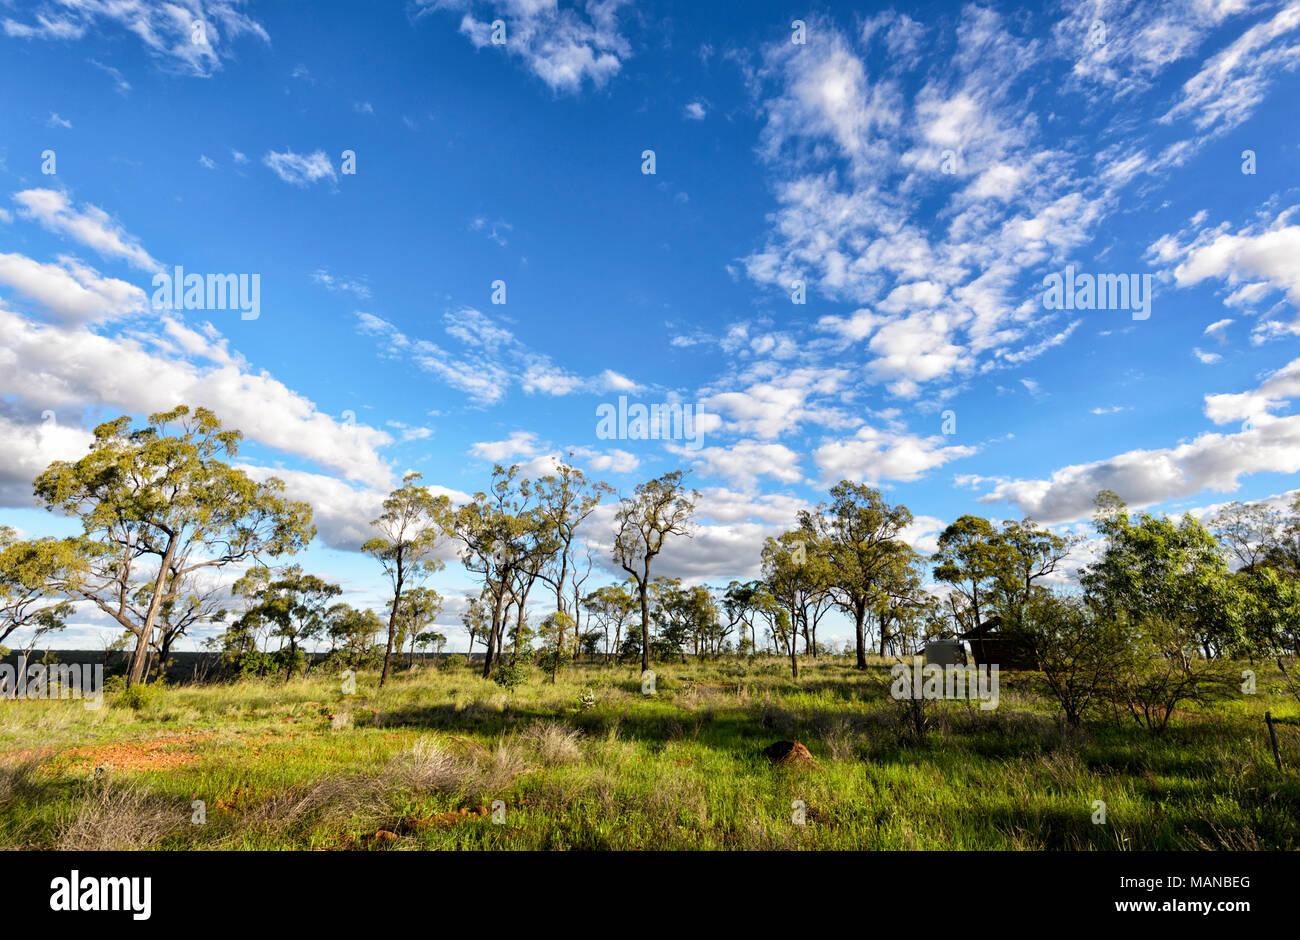 Savannah an der Spitze der Porcupine Gorge National Park, Queensland, Queensland, Australien Stockbild